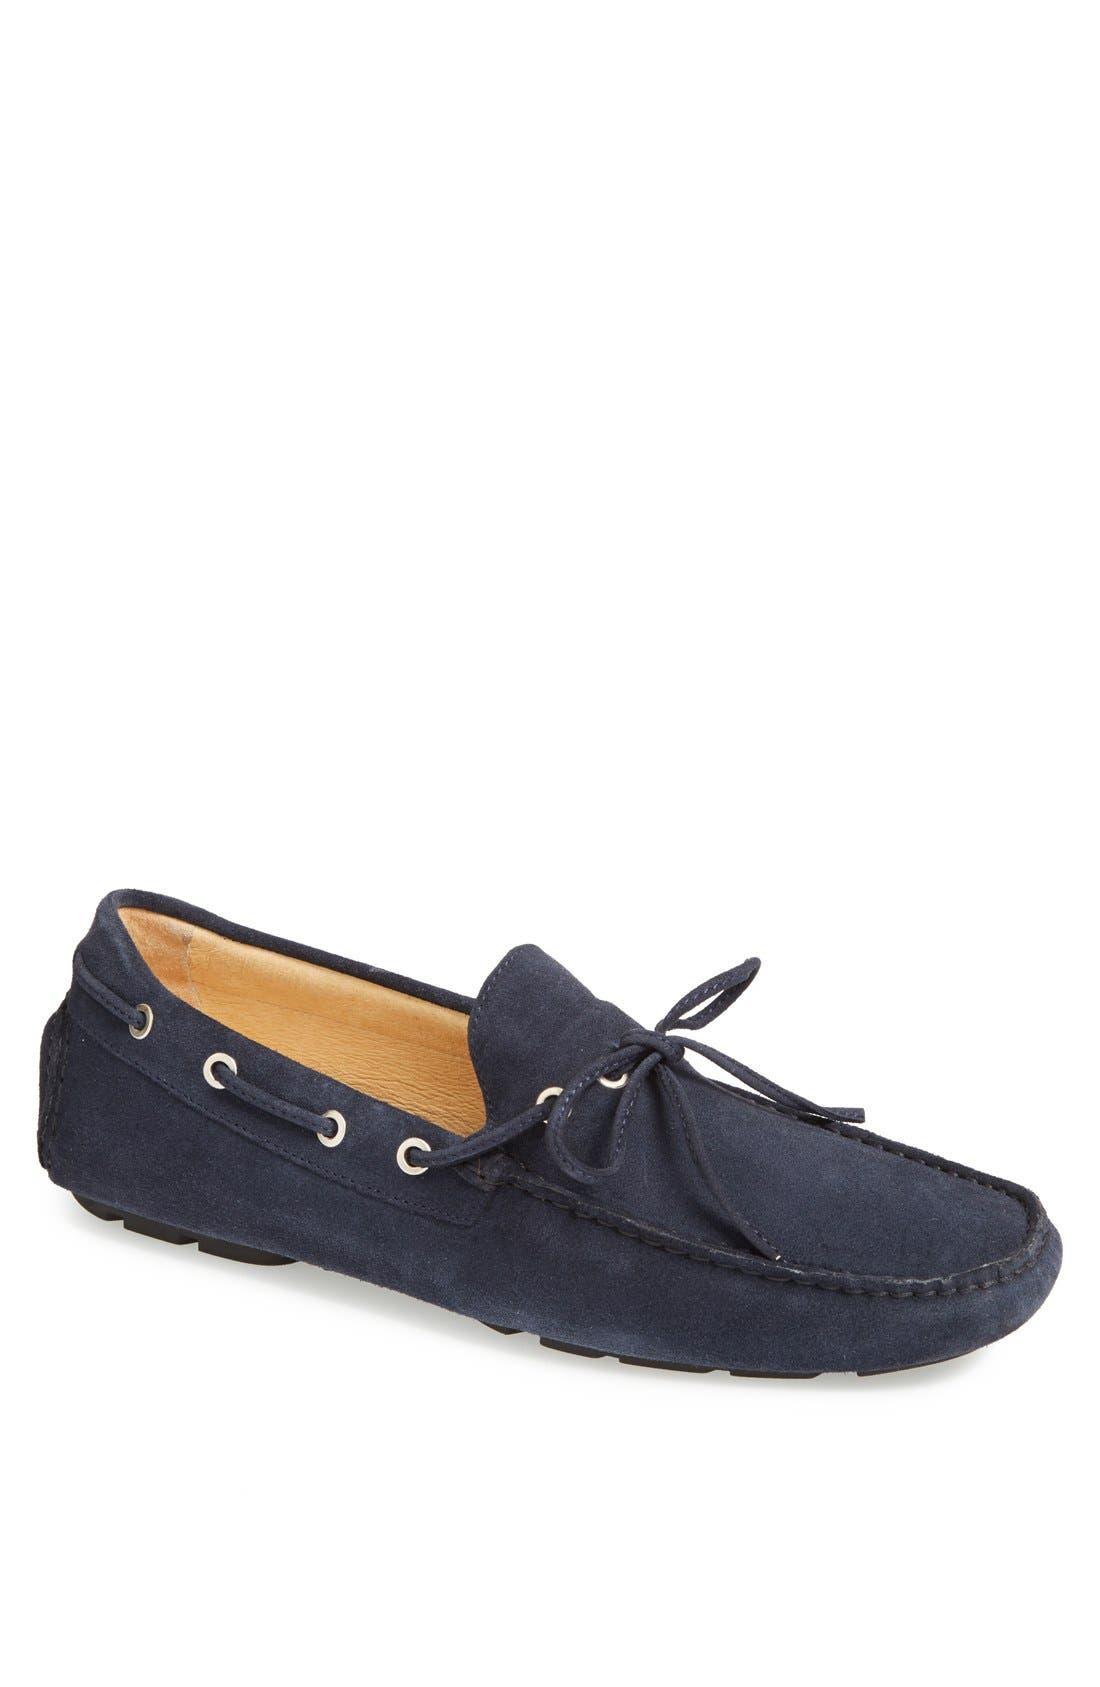 Main Image - Boemos Suede Driving Shoe (Men)